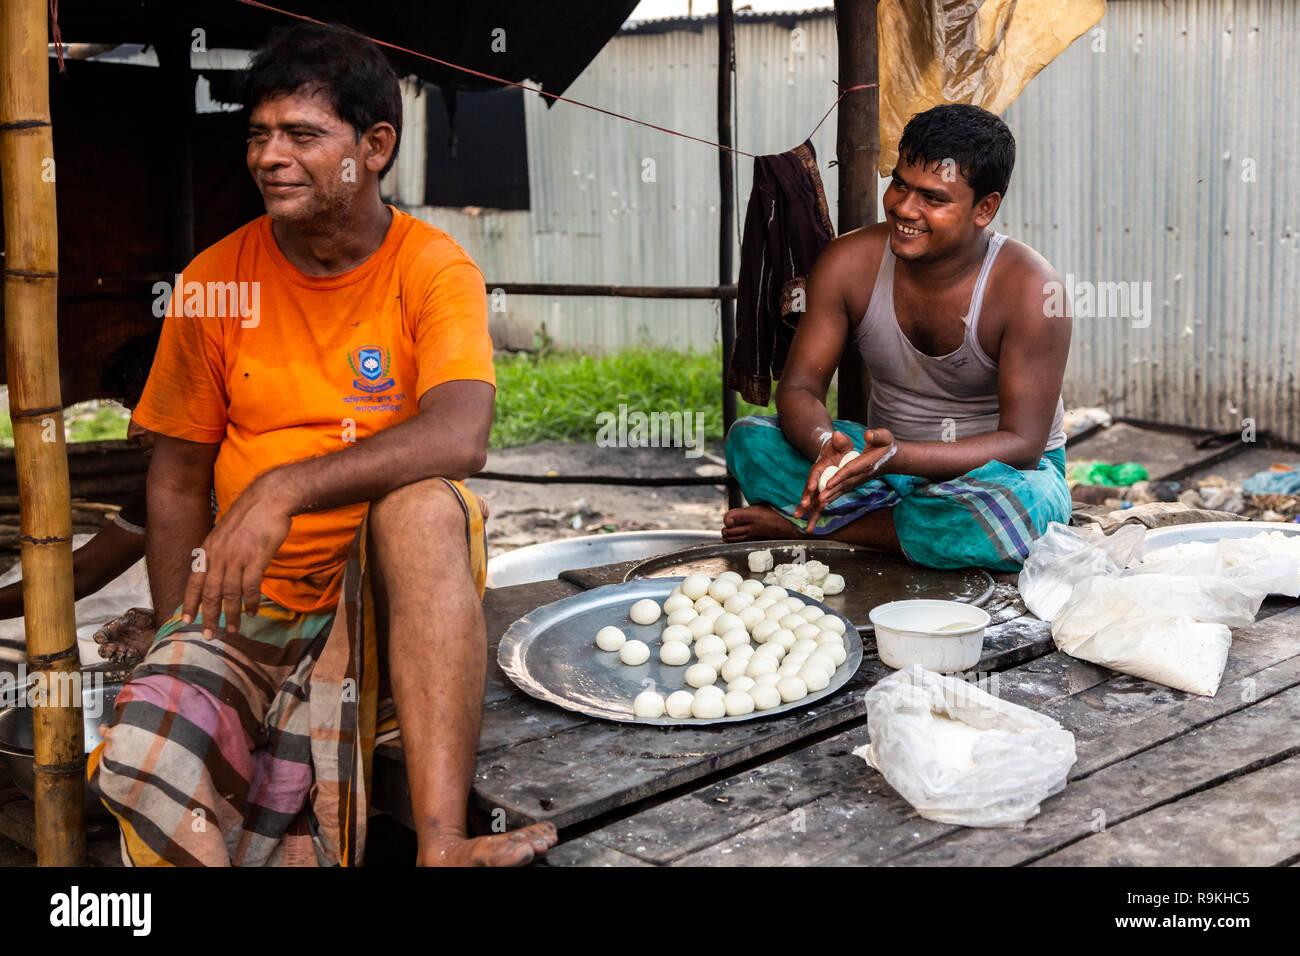 Making Traditional Bangladeshi/Indian sweet - Stock Image